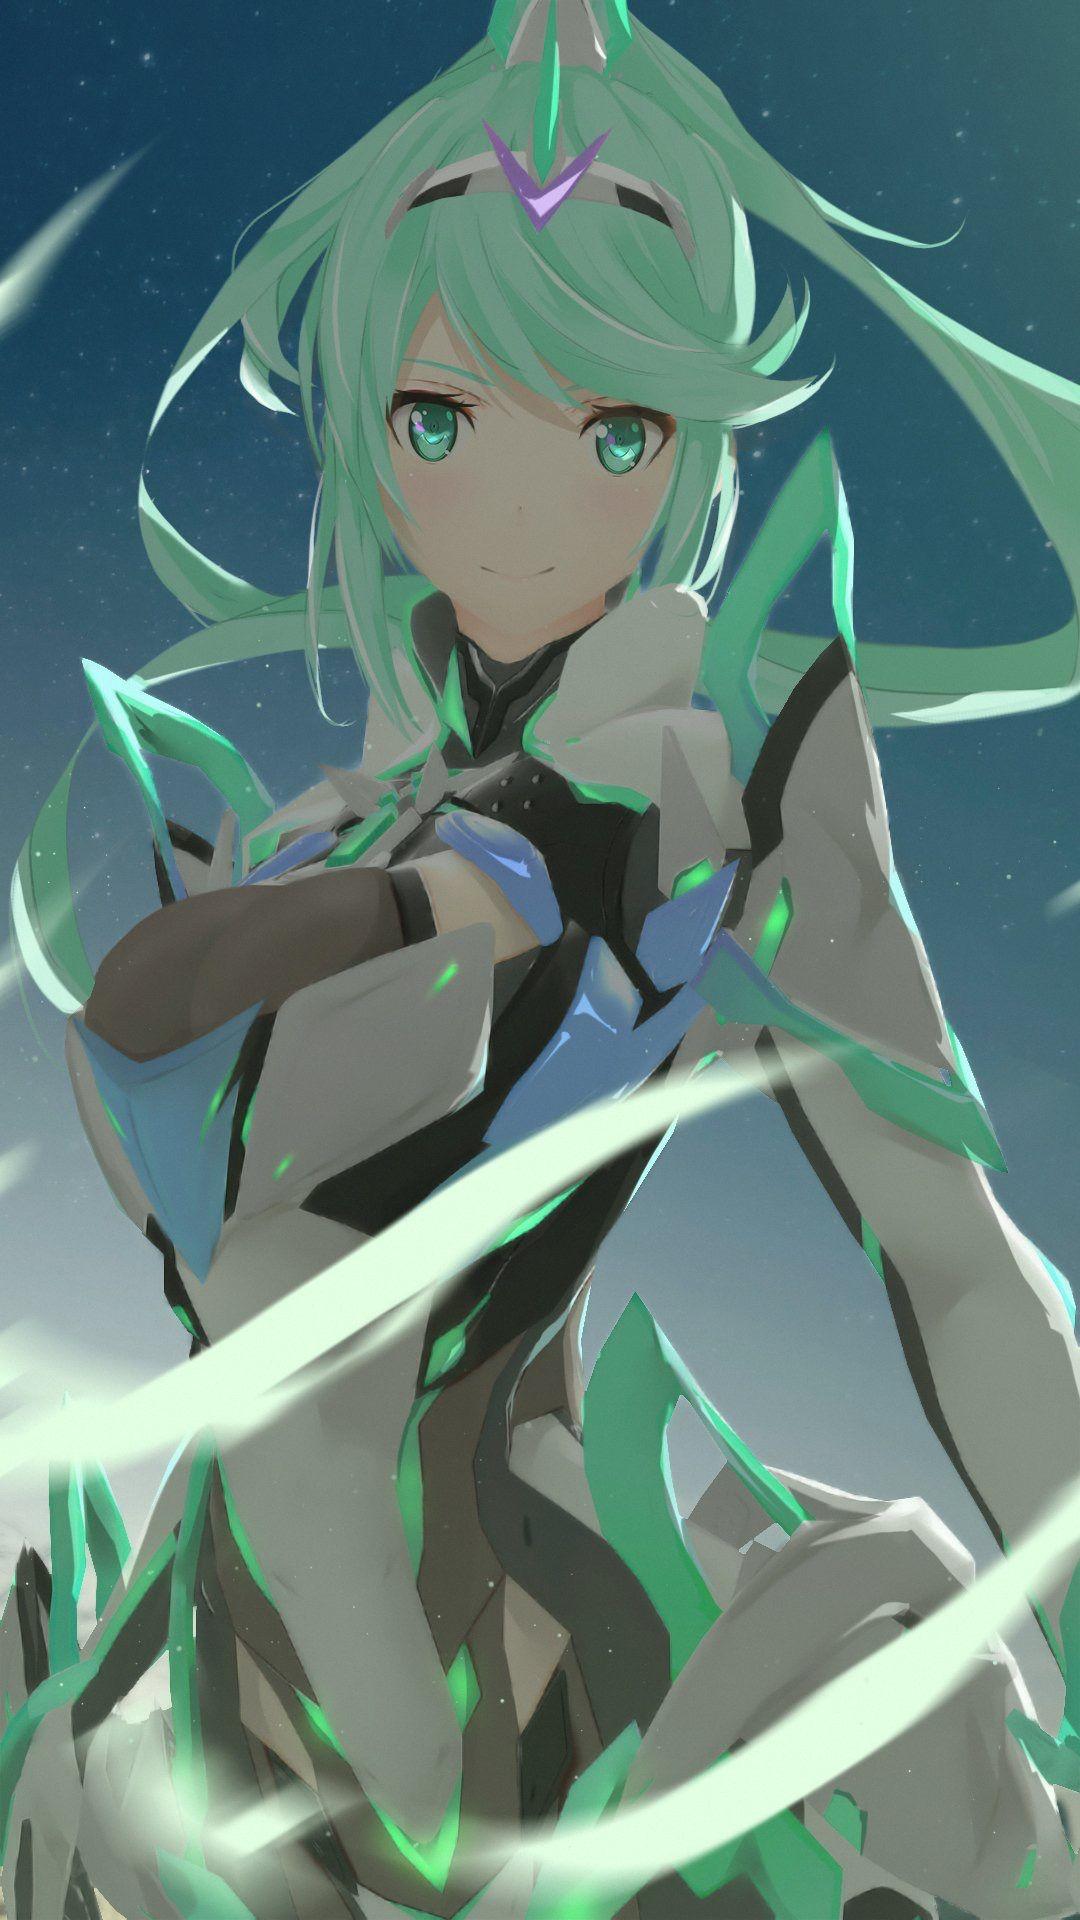 Shes important   Xenoblade Chronicles 2   Xenoblade chronicles, Xenoblade chronicles 2, Anime